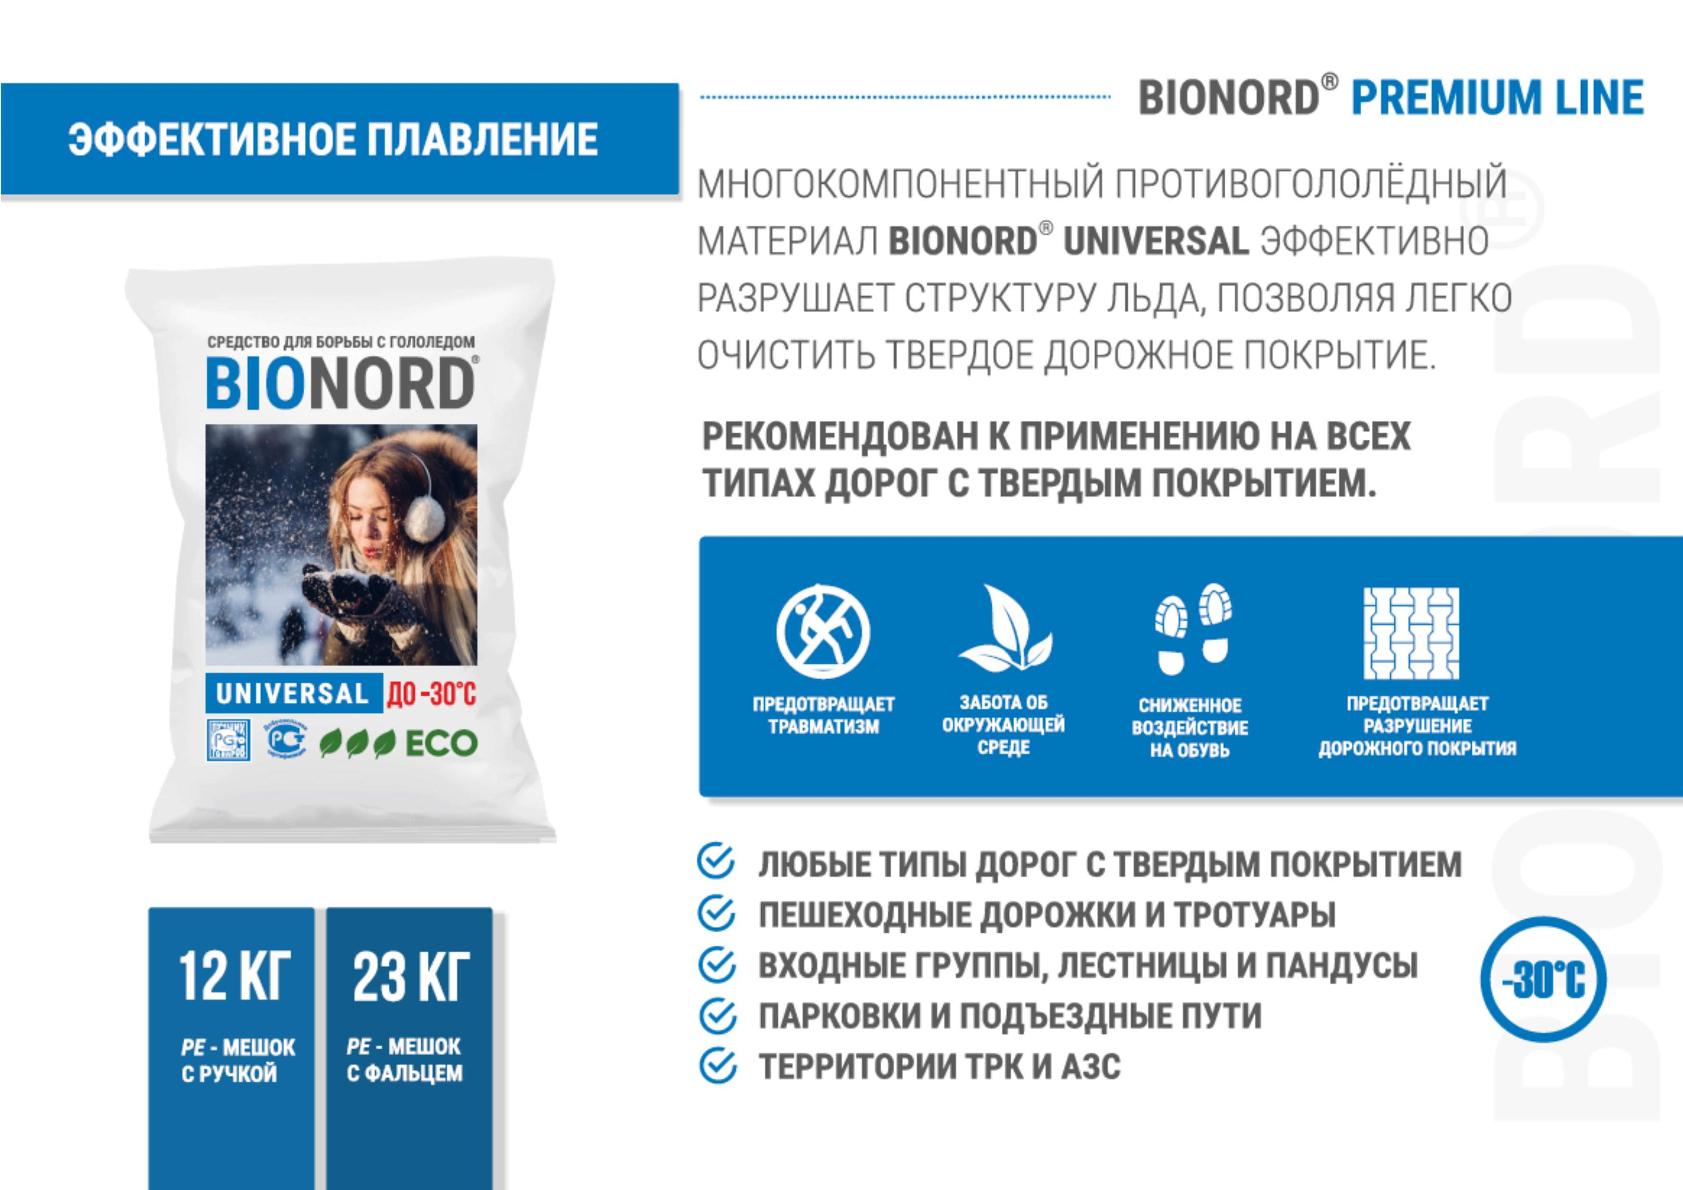 BIONORD UNIVERSAL - BIONORD® Premium Line